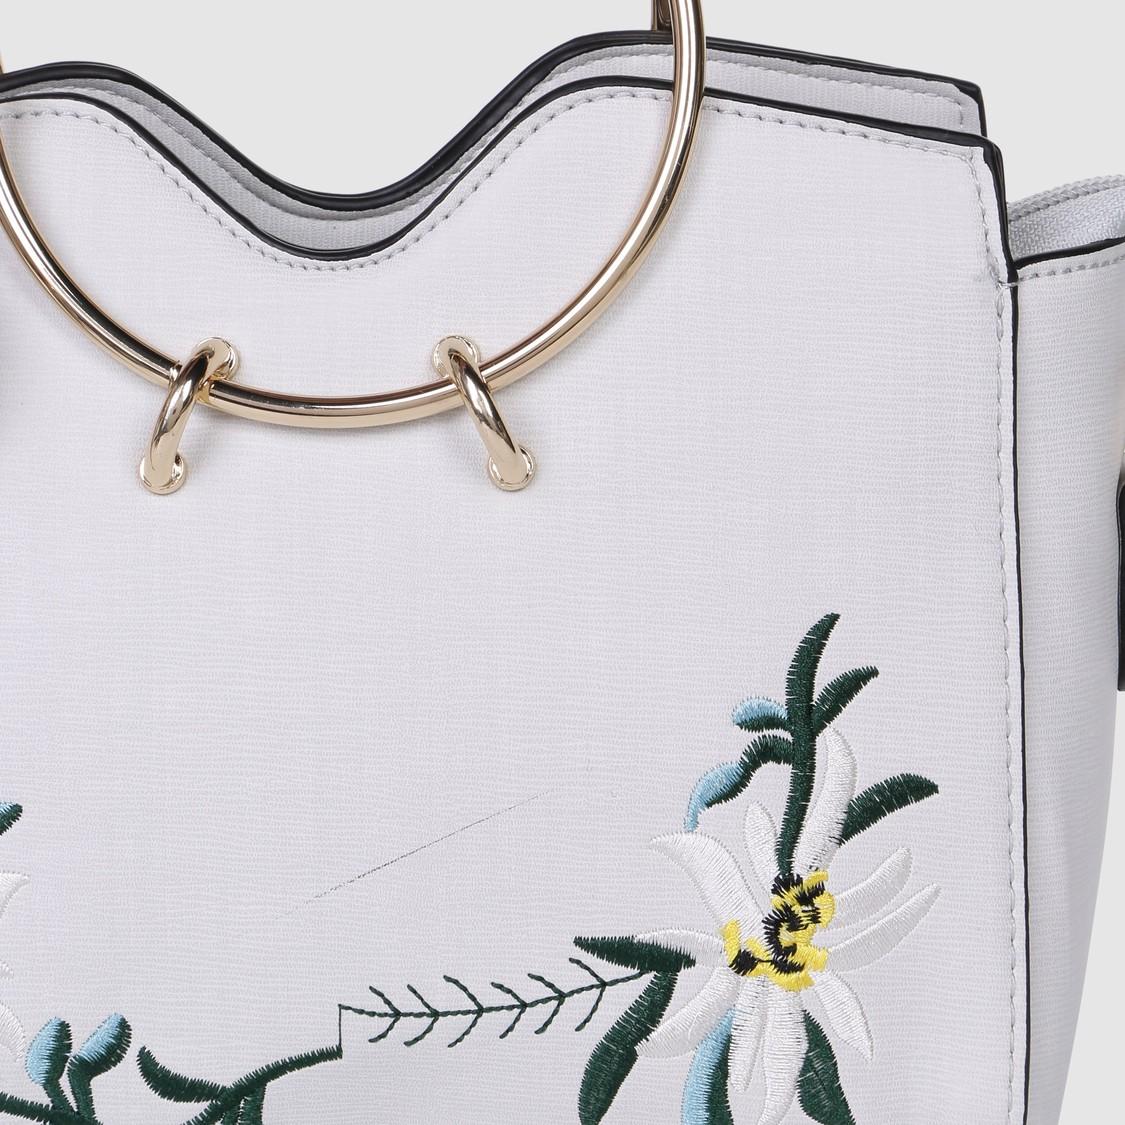 Embroidered Handbag with Round Metallic Handles